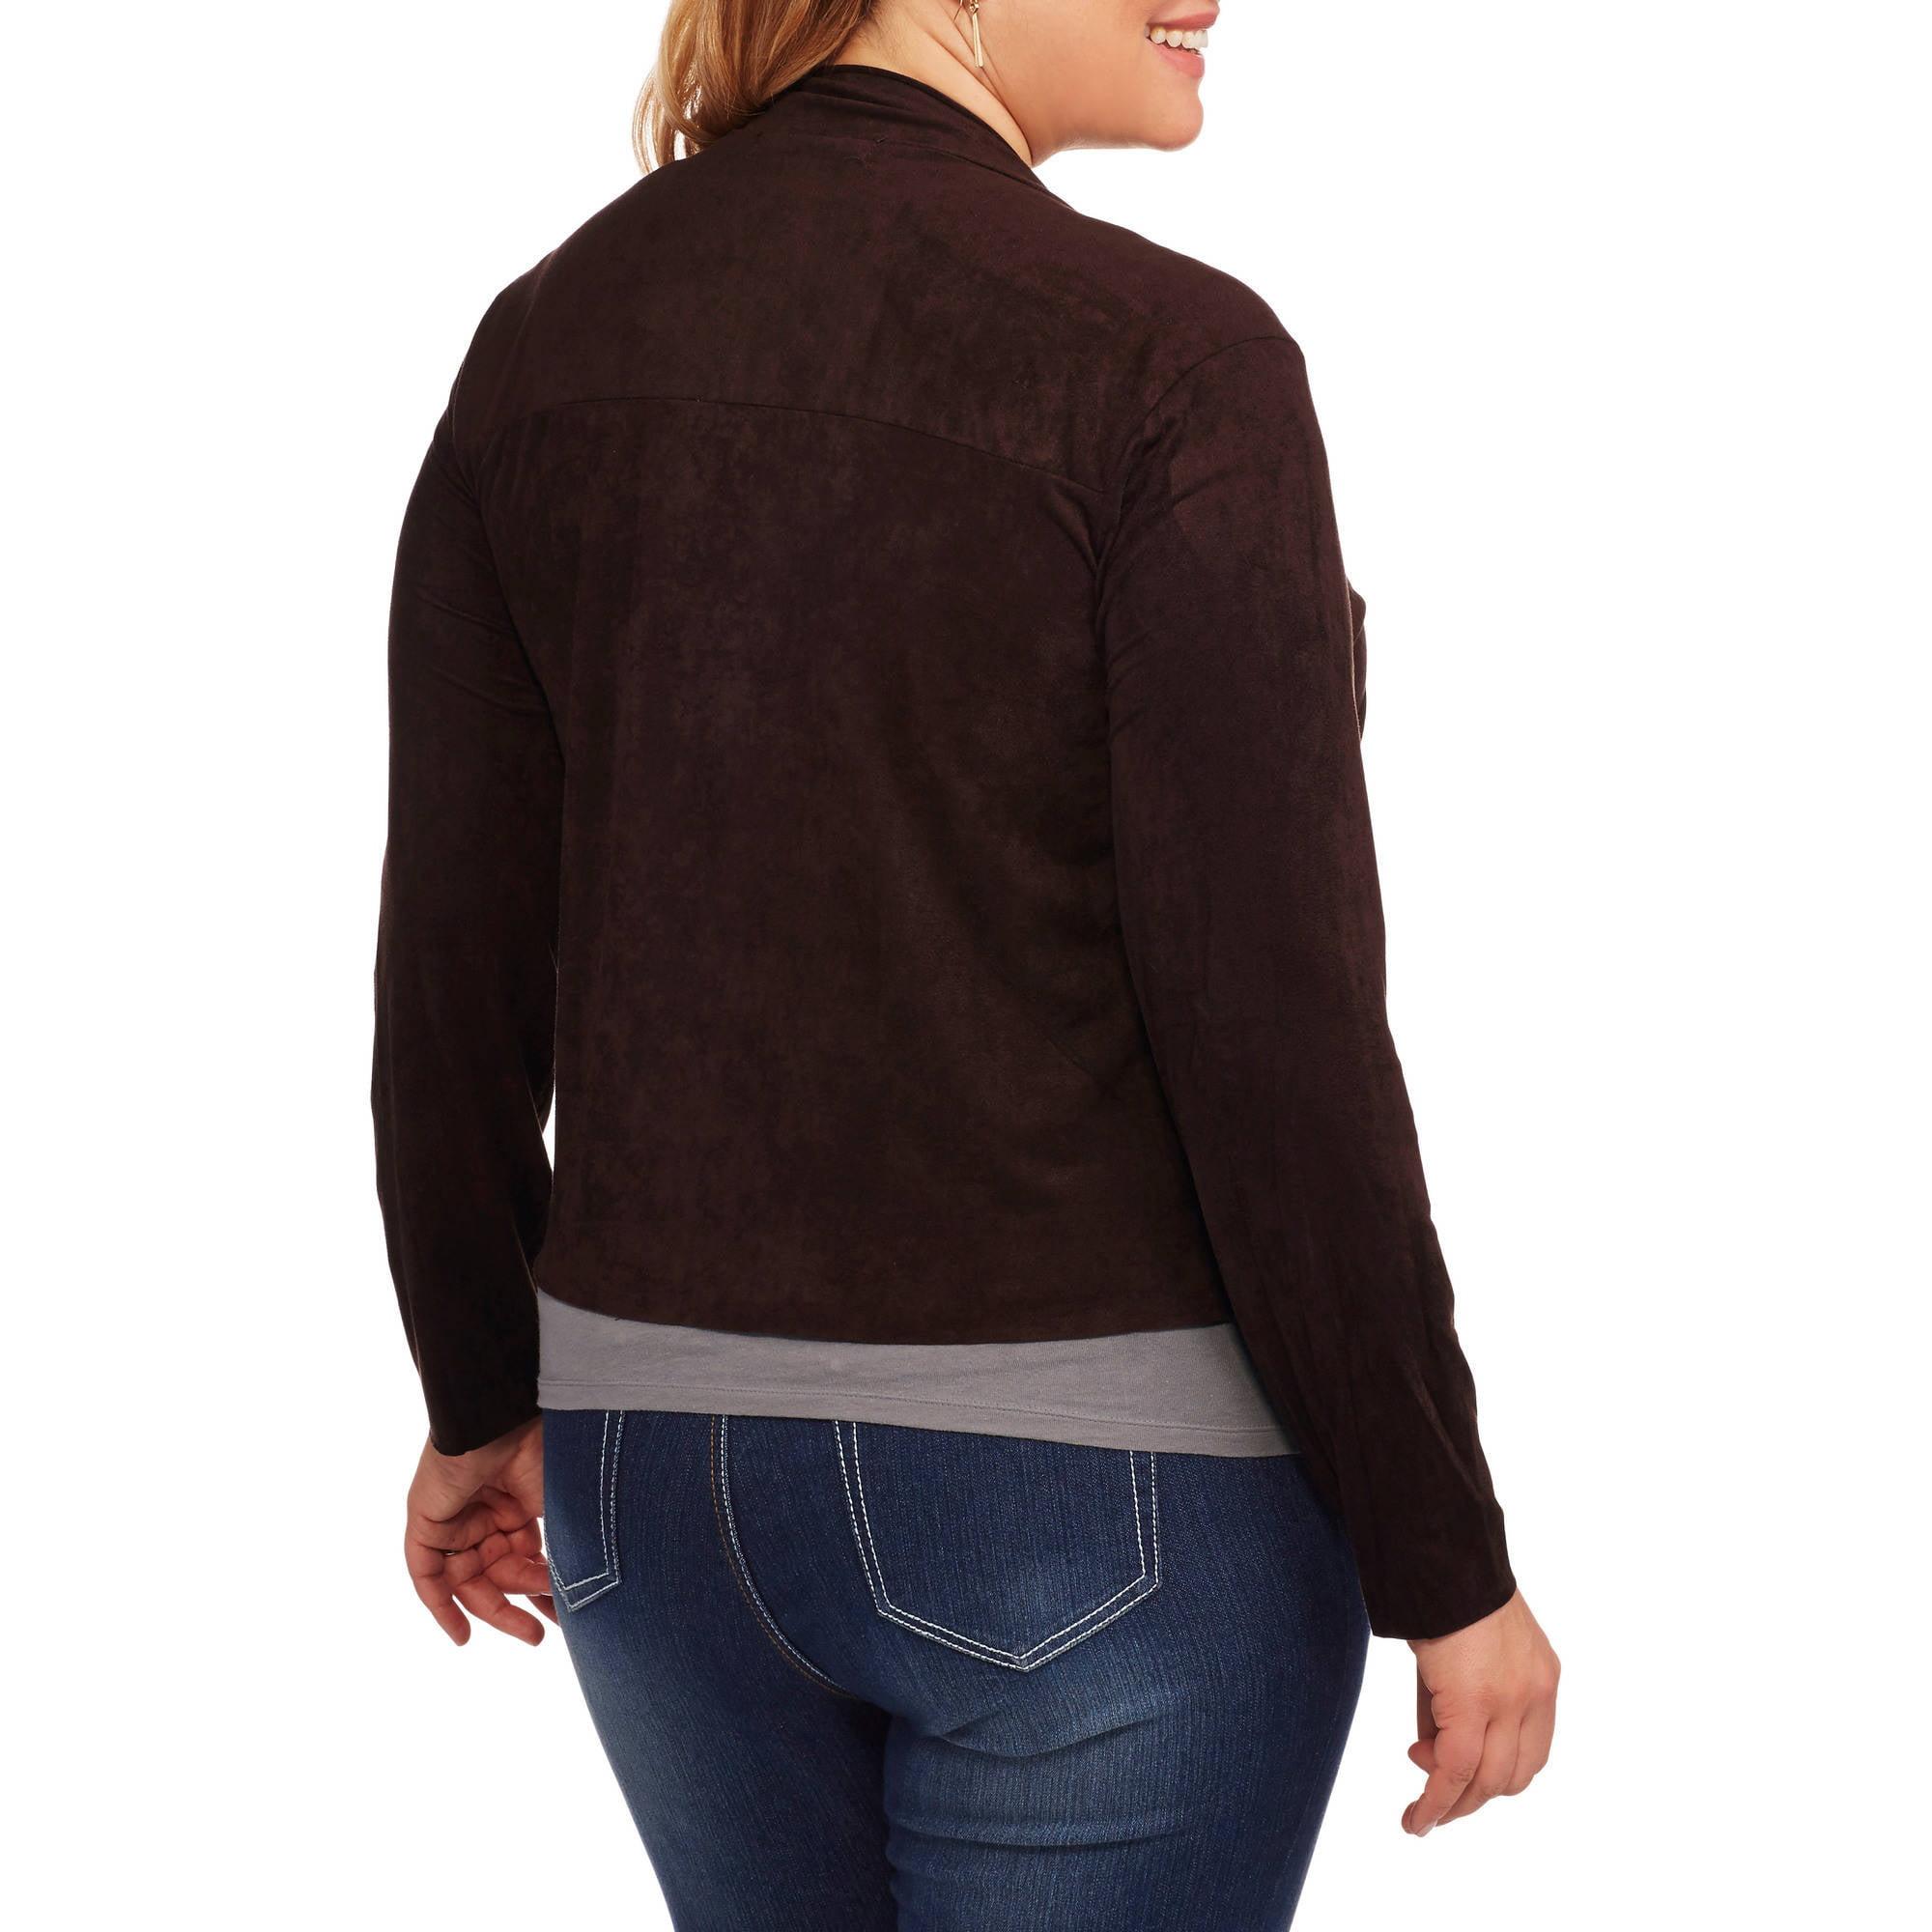 237218f3bfa French Laundry - Women s Plus Faux Suede Flyaway Jacket - Walmart.com